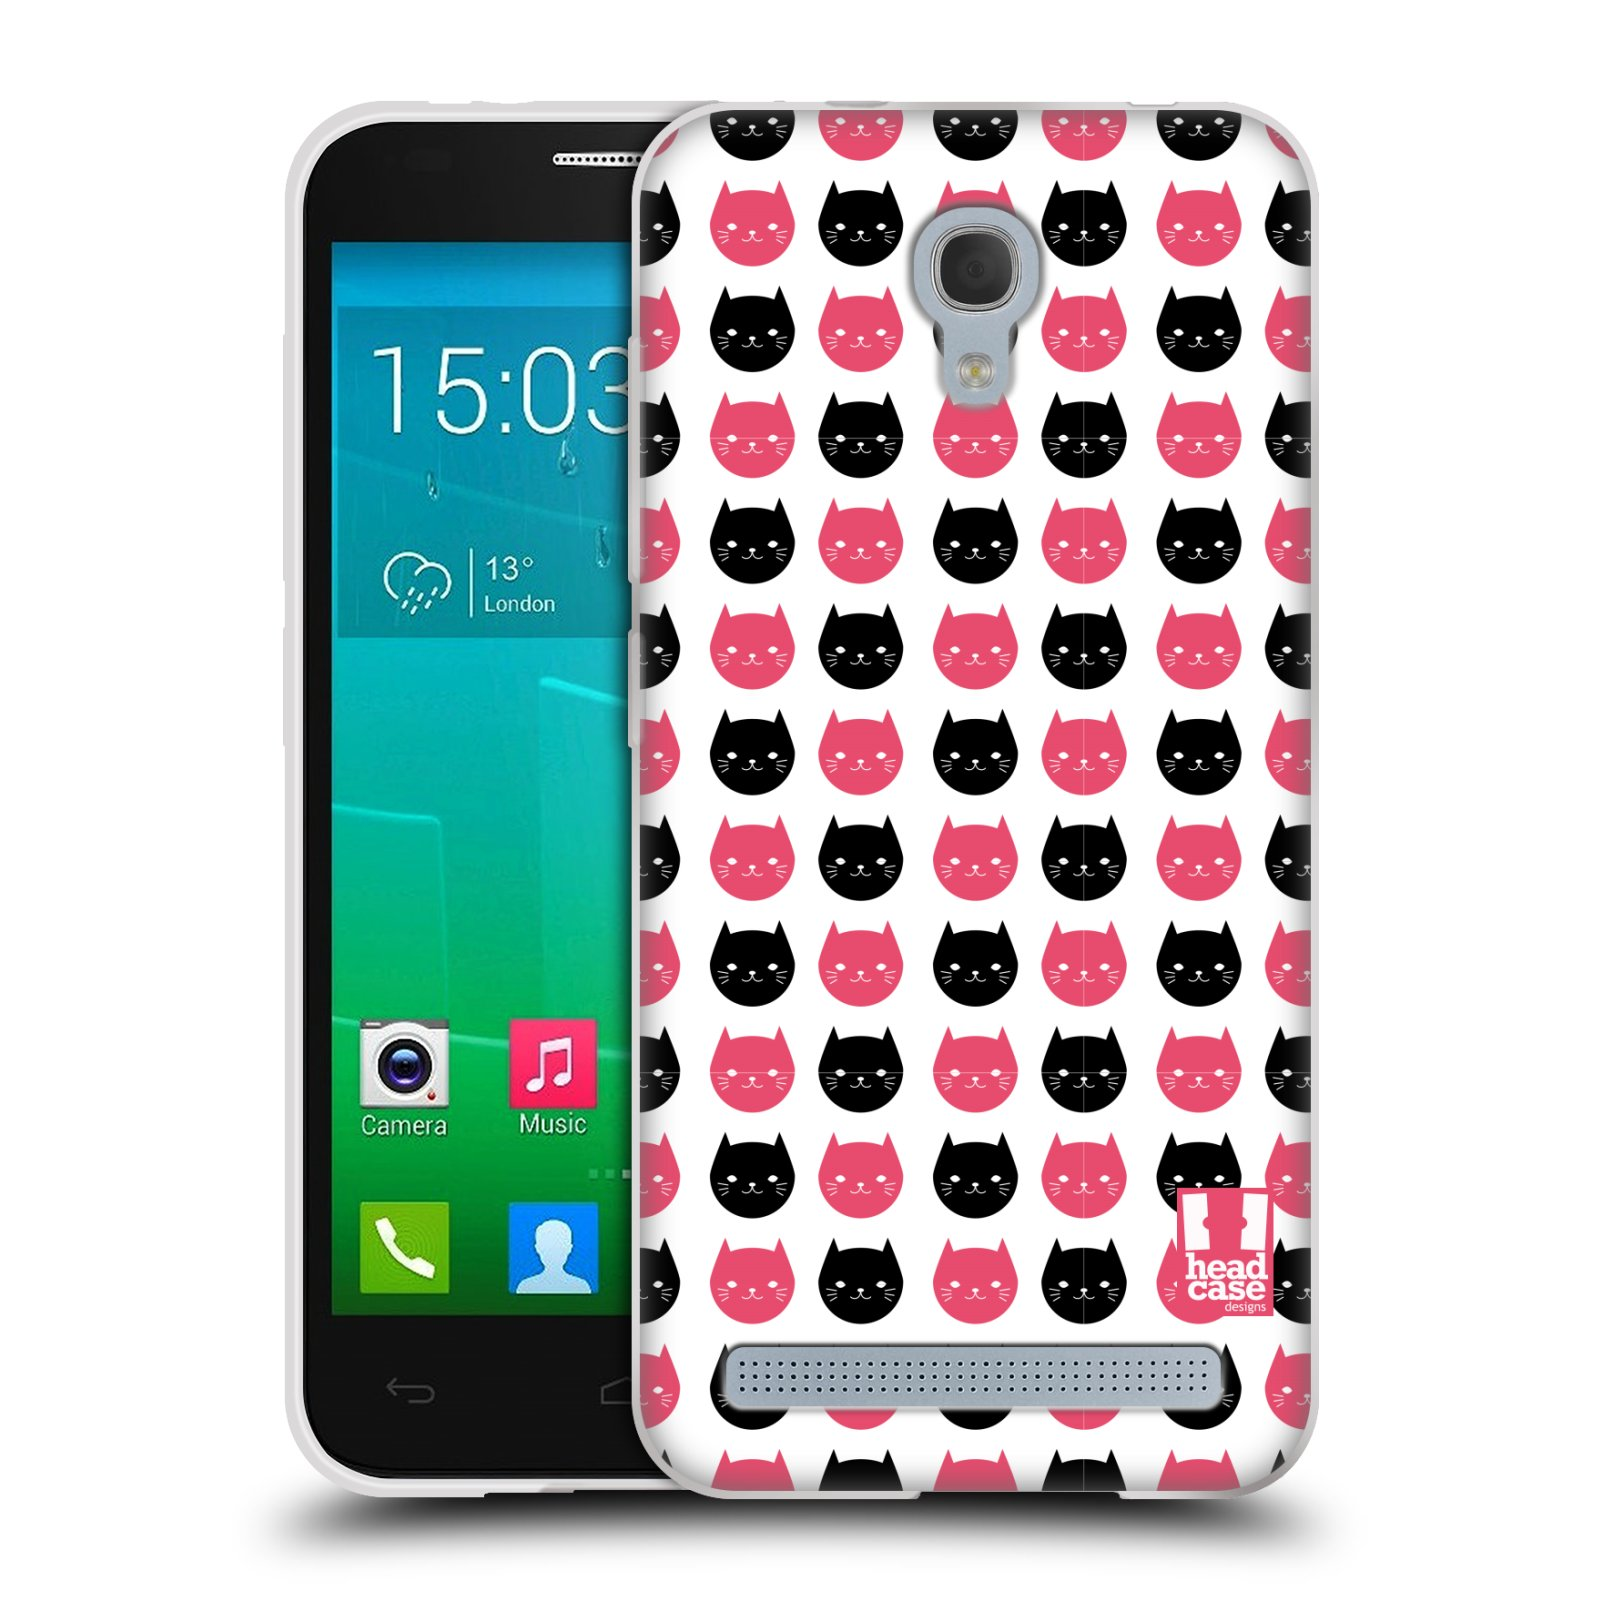 Silikonové pouzdro na mobil Alcatel One Touch Idol 2 Mini S 6036Y HEAD CASE KOČKY Black and Pink (Silikonový kryt či obal na mobilní telefon Alcatel Idol 2 Mini S OT-6036Y)